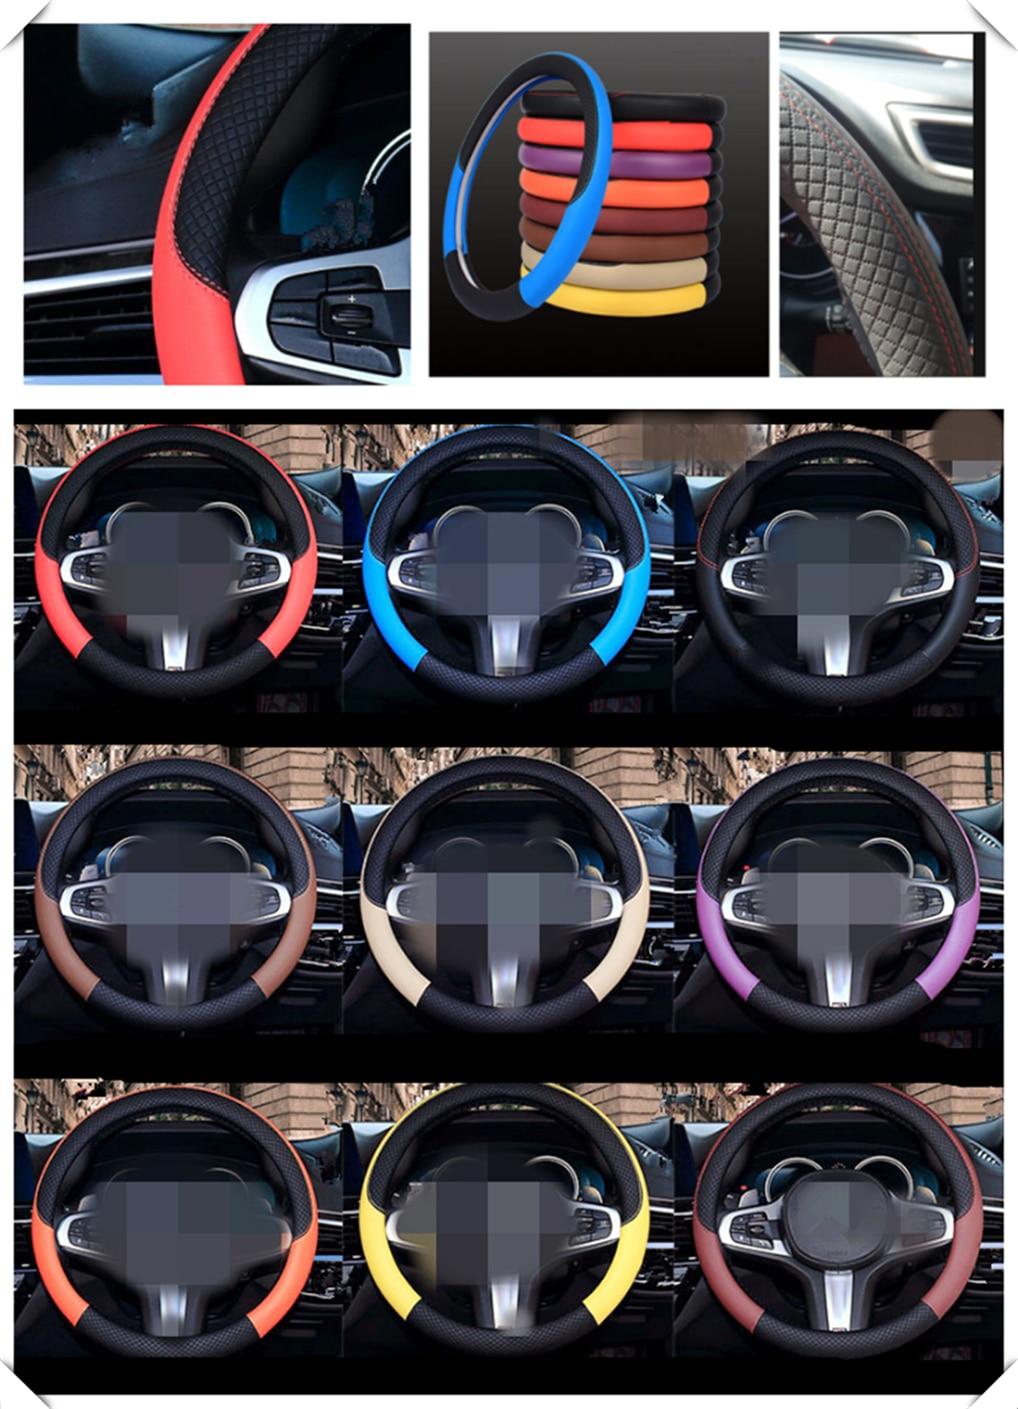 Auto partes volante cubierta 38 cm o 15 pulgadas cuero tejido para Renault Alaskan Trezor Talisman Kwid Espace Kangoo